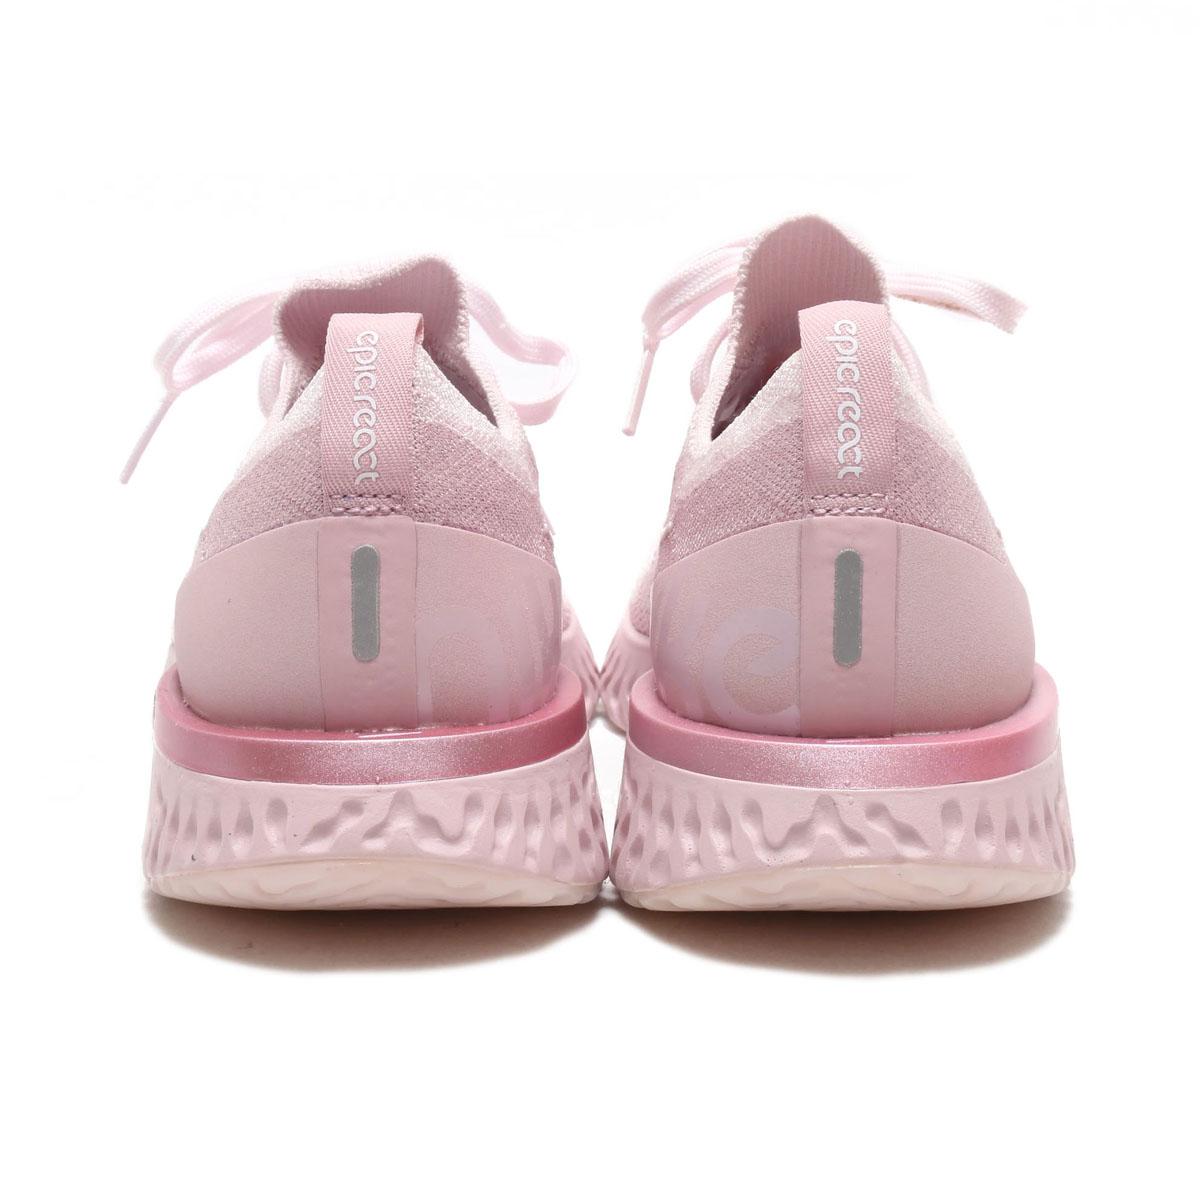 Atmos Pink Nike Wmns Epic React Flyknit Nike Women Epic